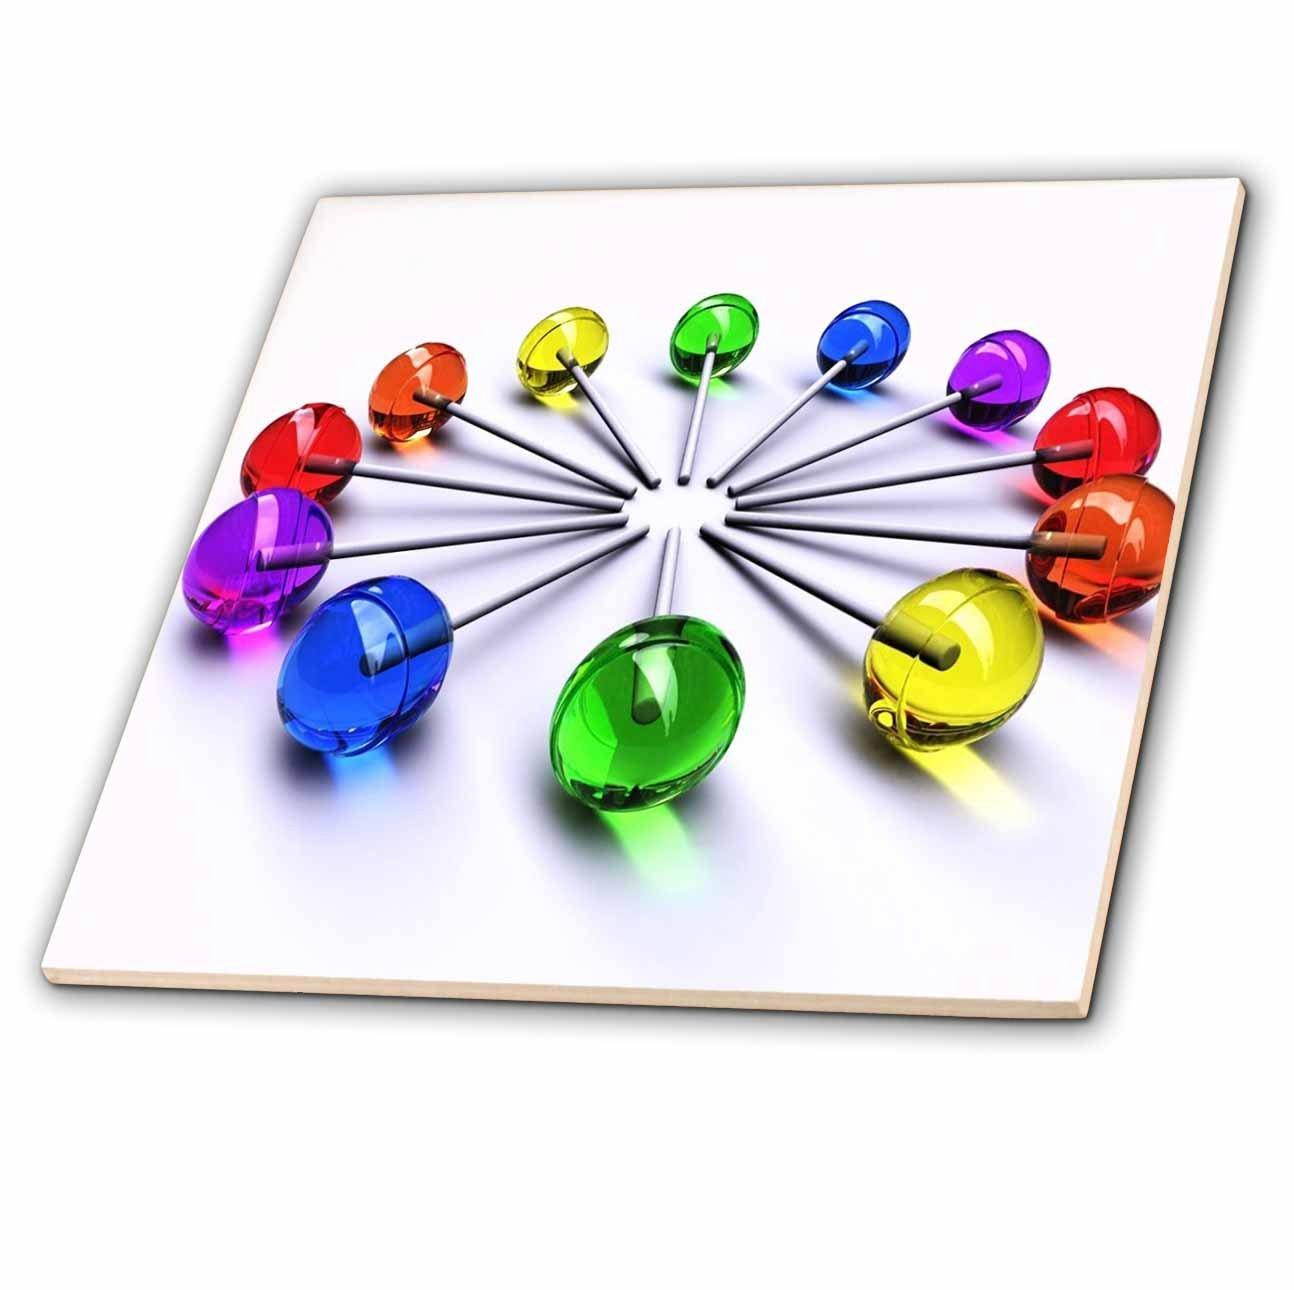 4-Inch 3dRose ct/_53271/_5 Lollipop Clock Glass Tile